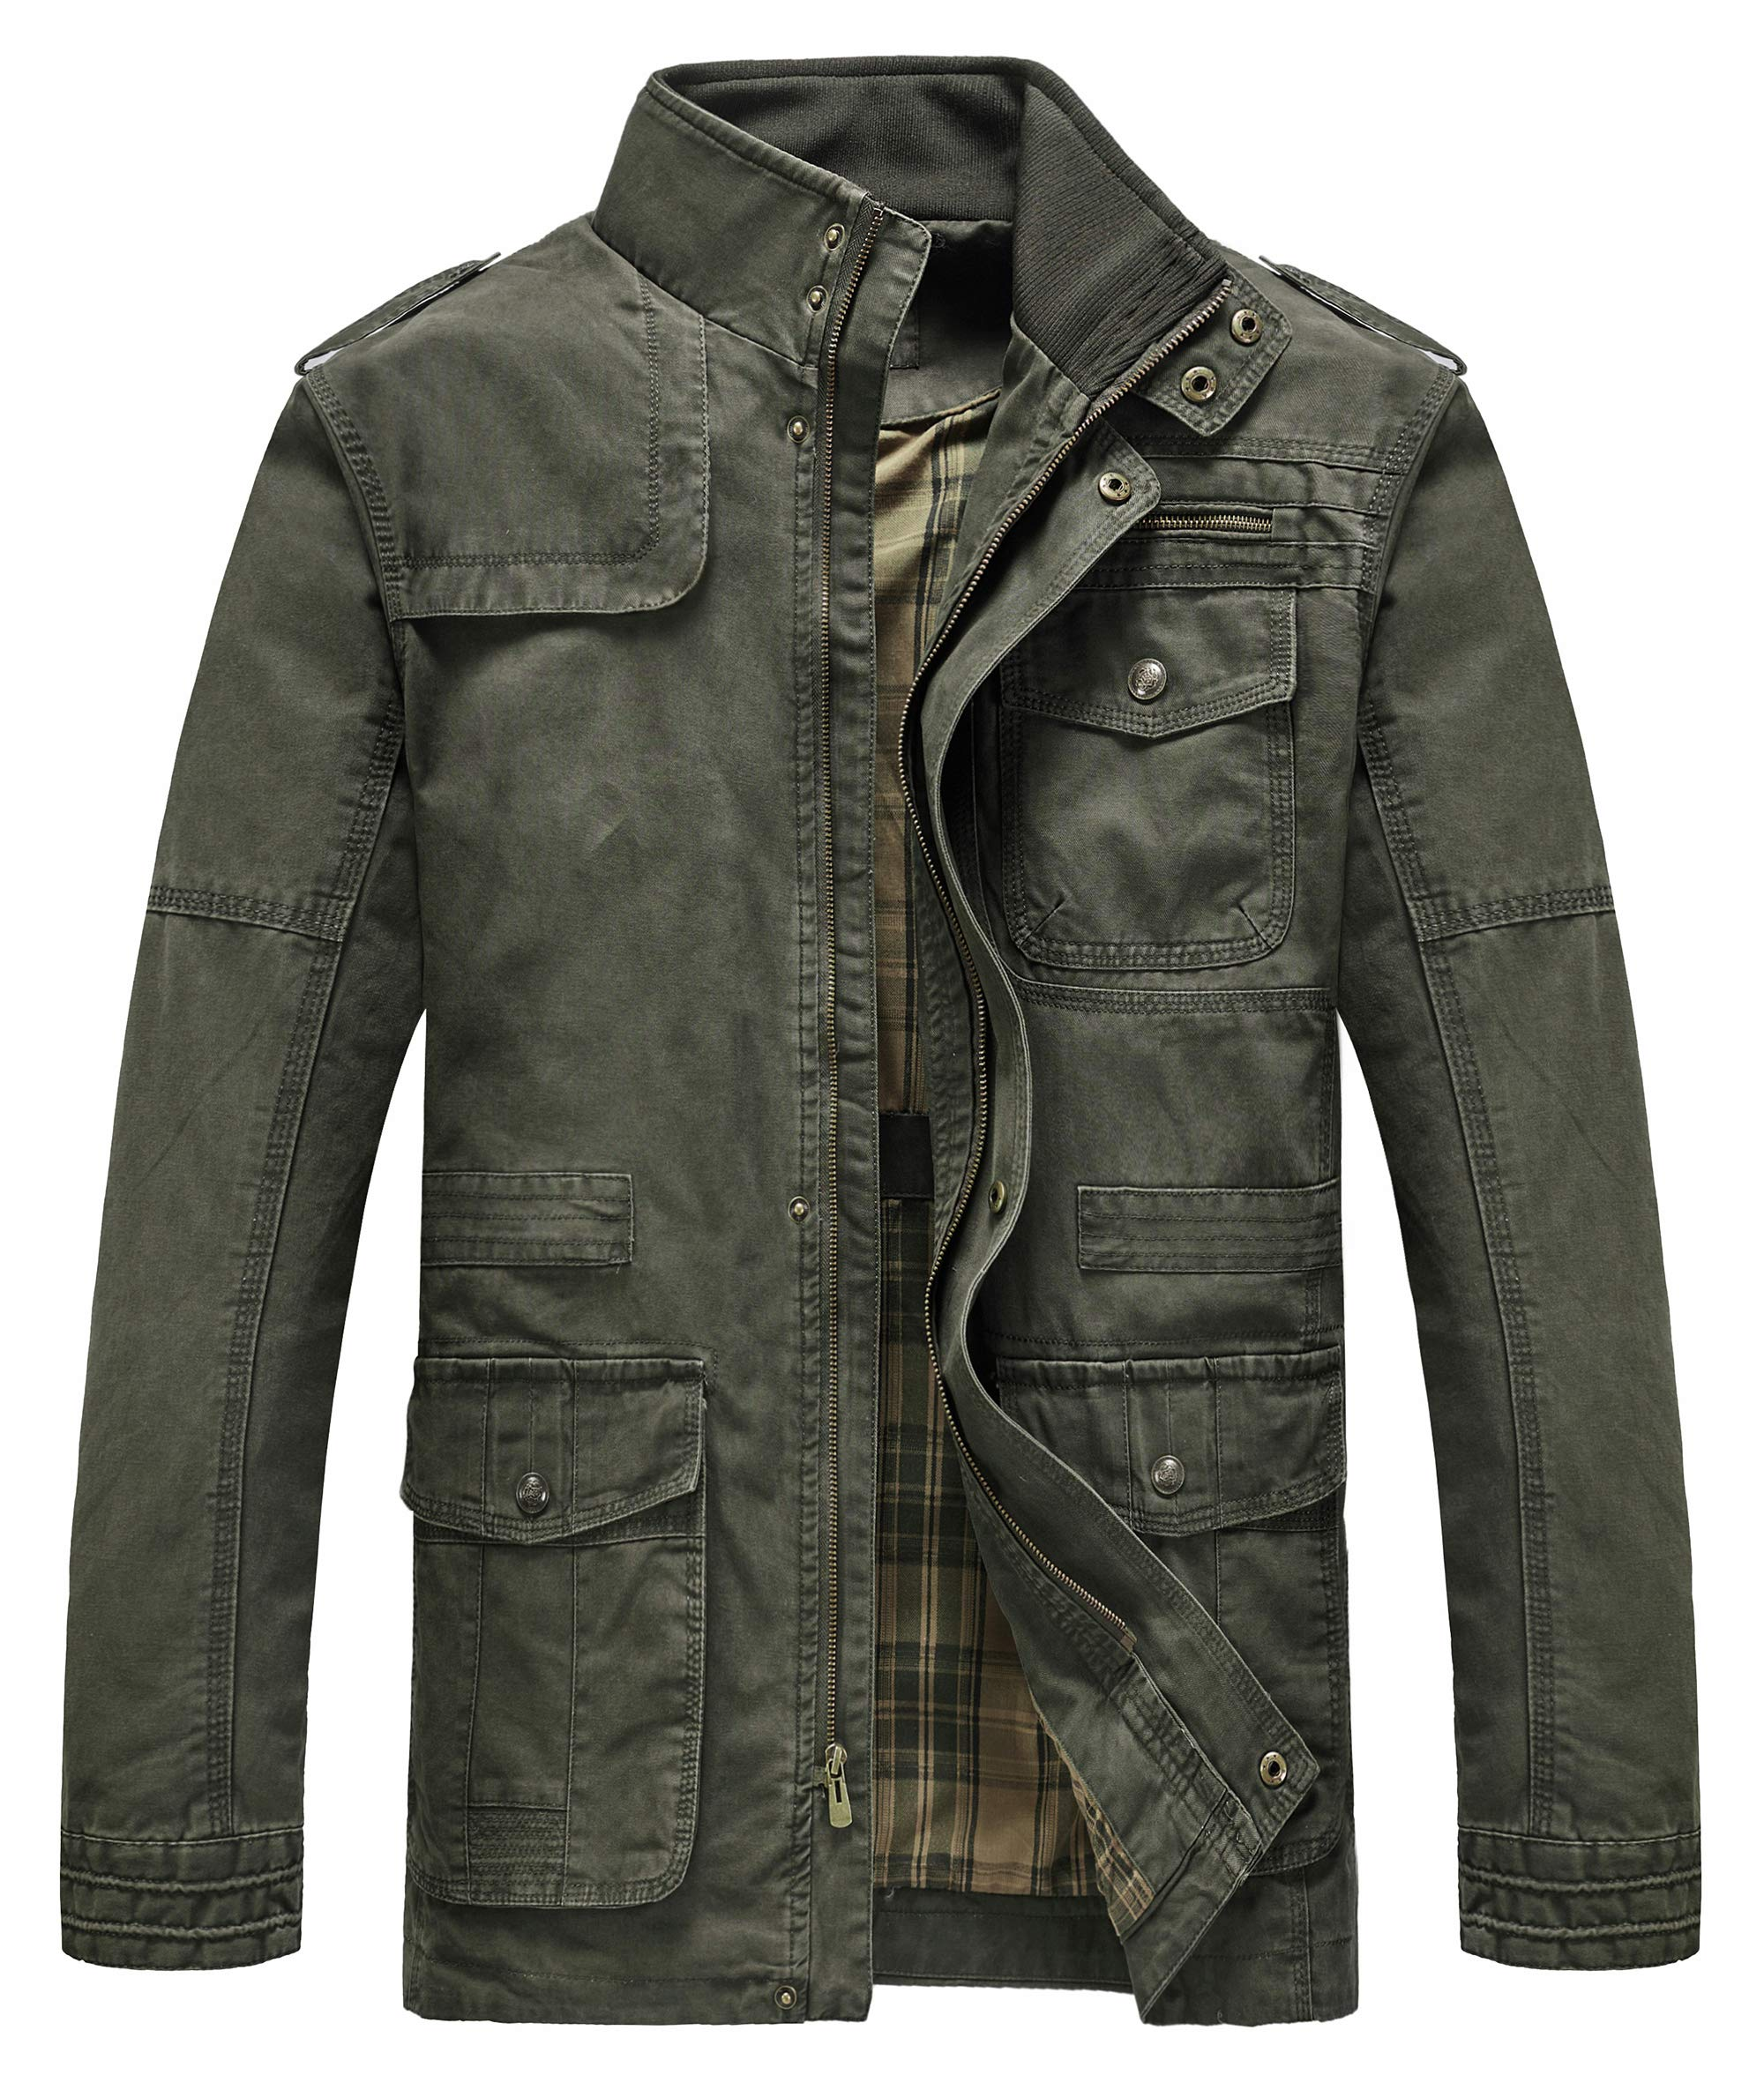 Heihuohua Men's Classic Field Coat Cotton Stand Collar Military Windbreaker Jacket, Green Army, Medium by Heihuohua